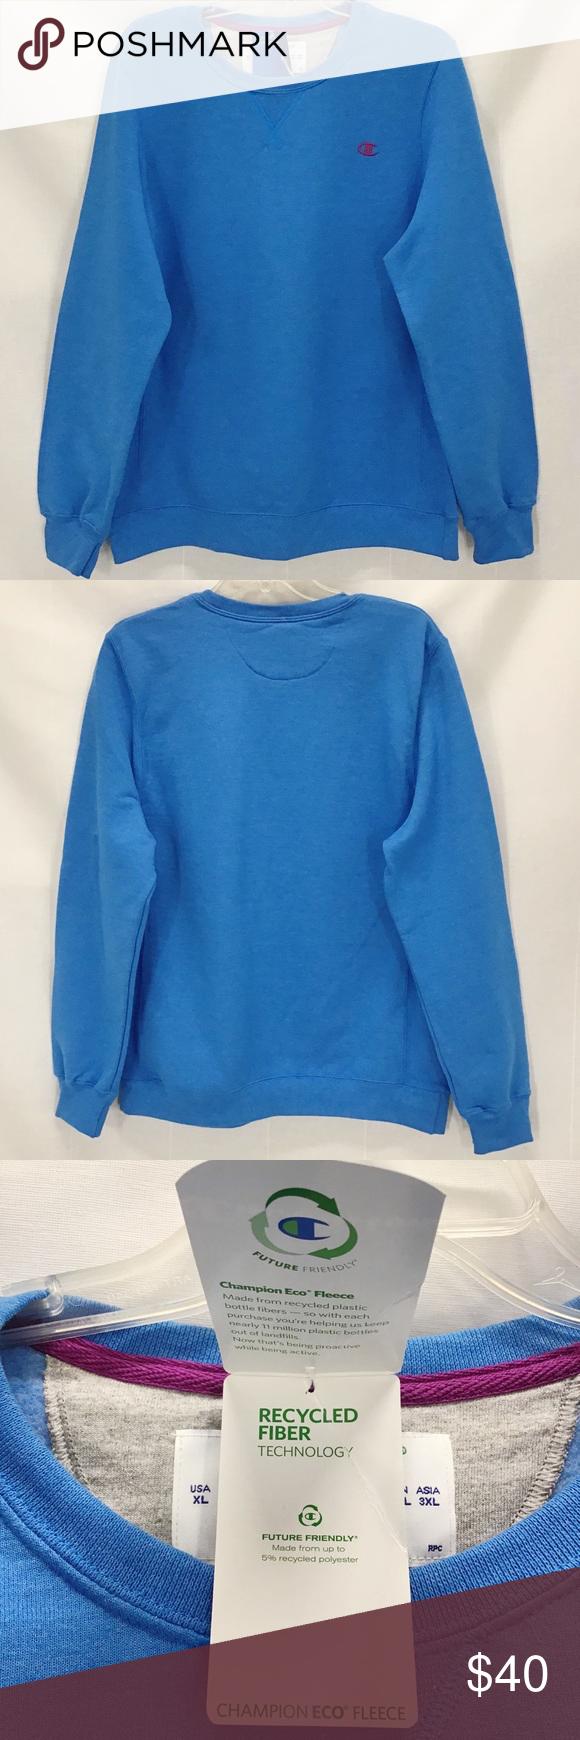 Champion Eco Xl Blue Pullover Crew Sweatshirt Nwt Champion Eco Pullover Crew Sweatshirt Color Balboa Blue Size Pullover Champion Sweatshirt Crew Sweatshirts [ 1740 x 580 Pixel ]